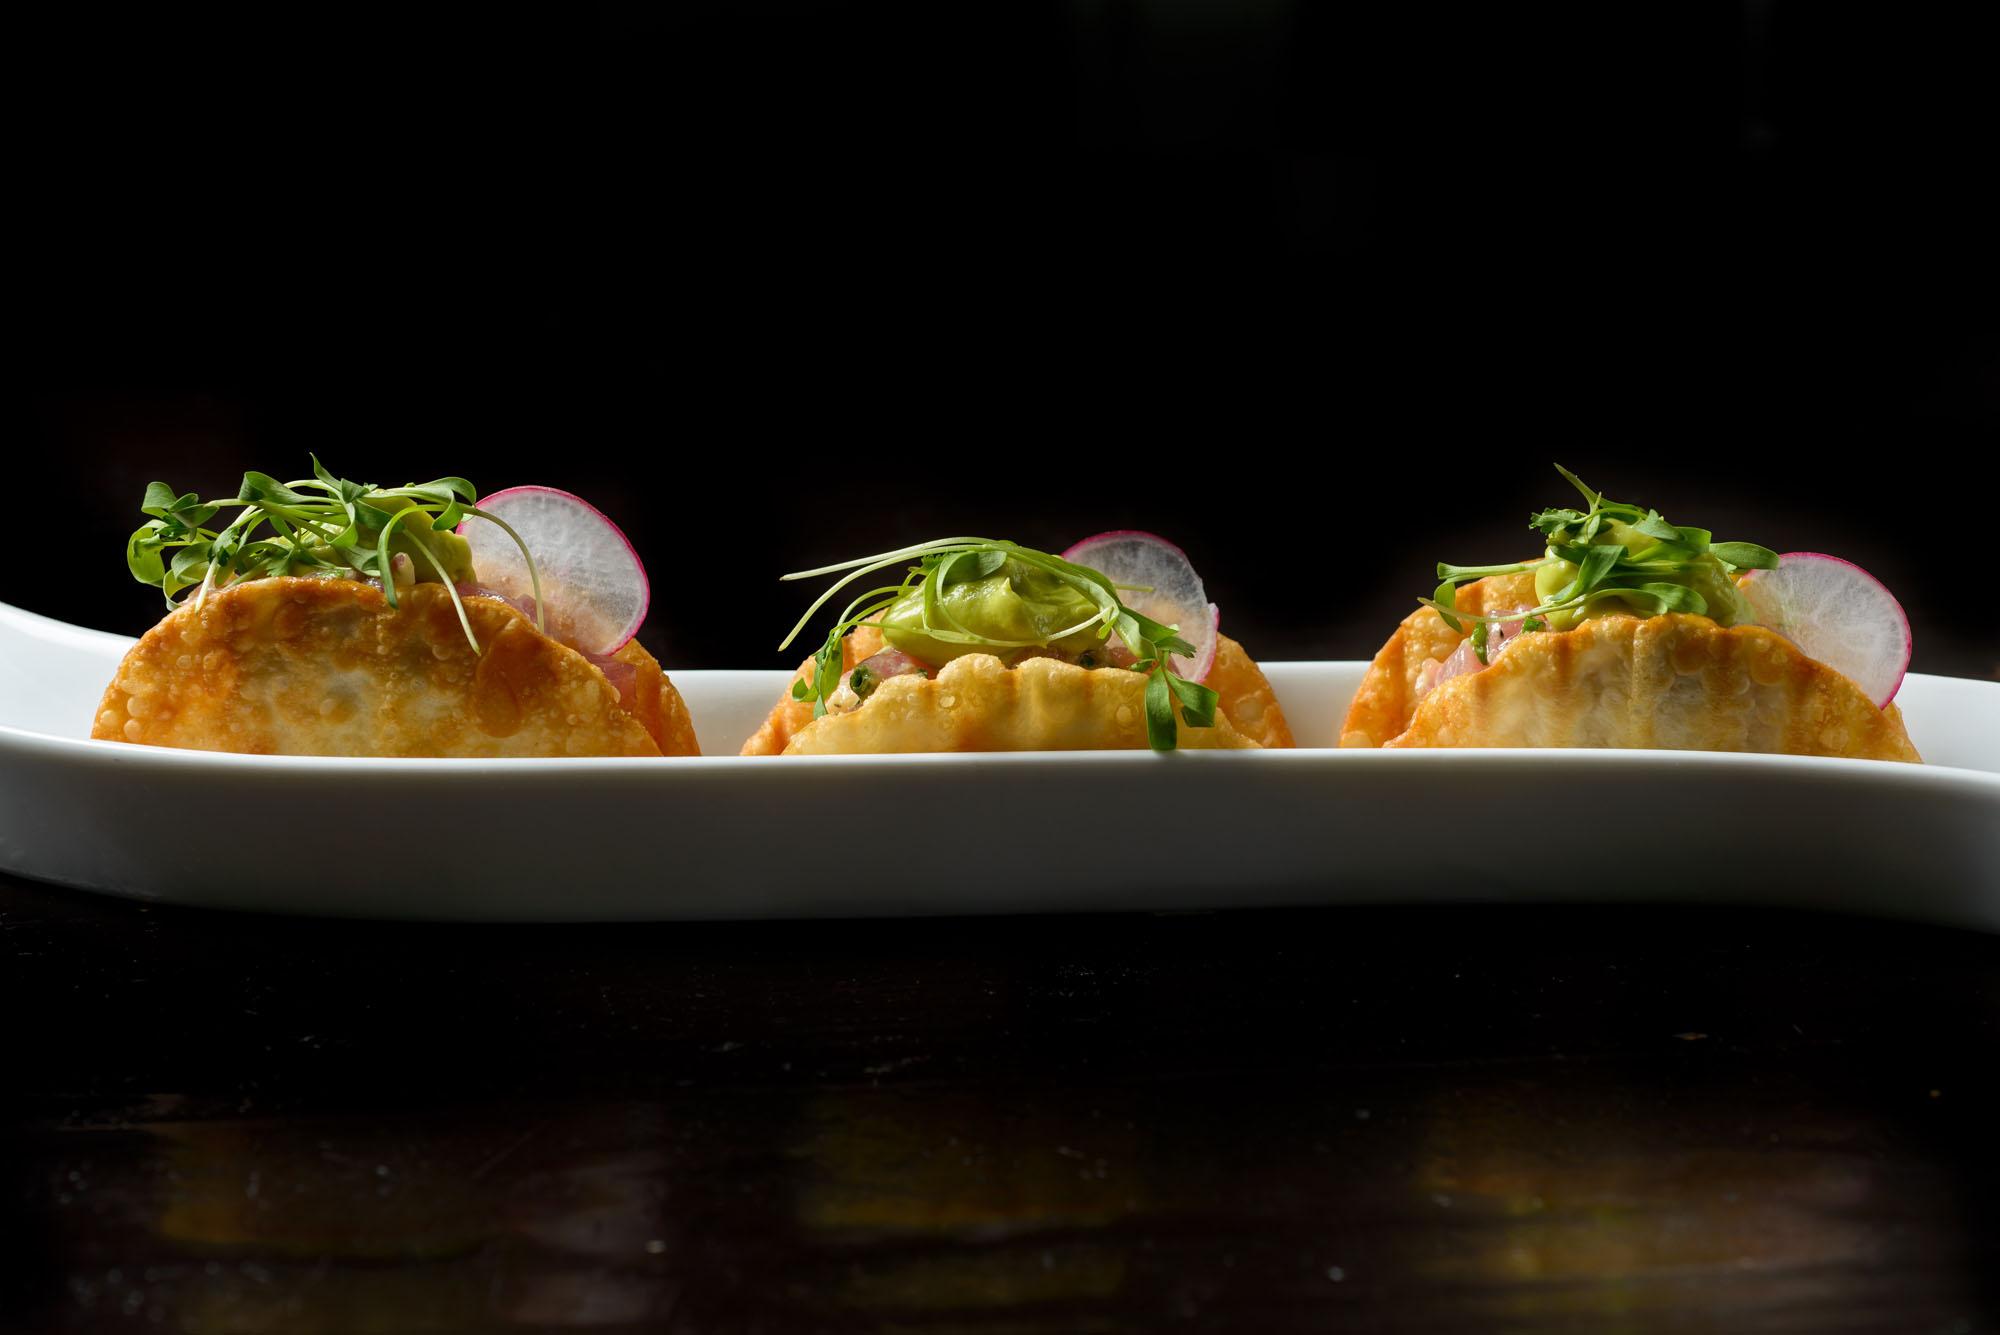 7048_d800_Westin_Maso_New_Menu_John_Hart_San_Francisco_Food_Photography.jpg